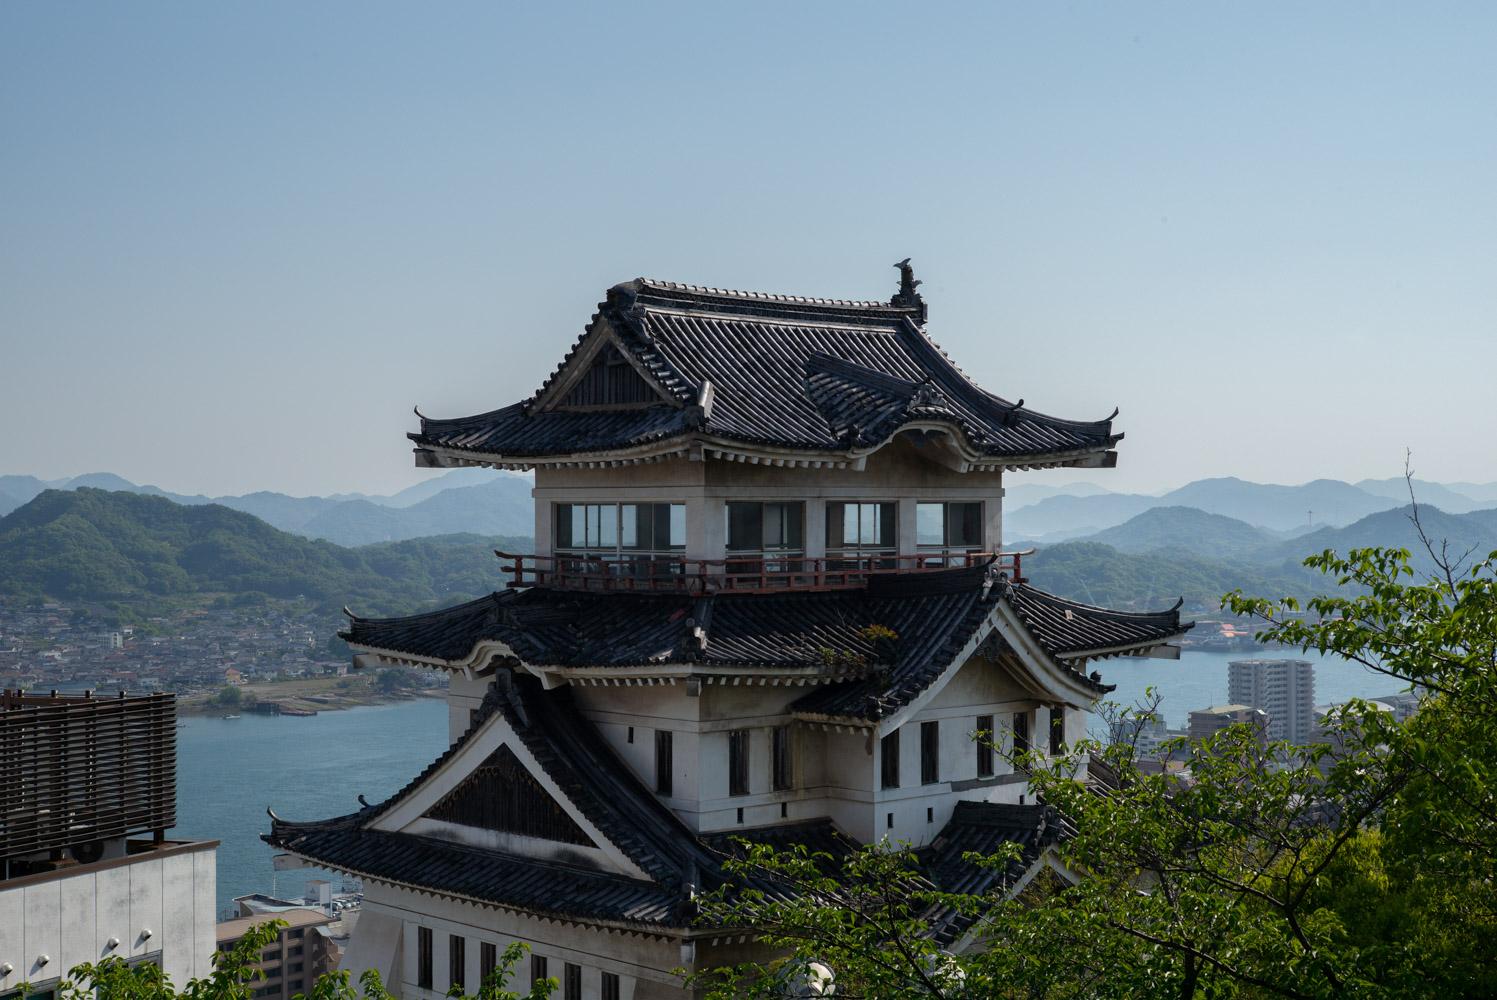 takesanpo-hiroshima-51